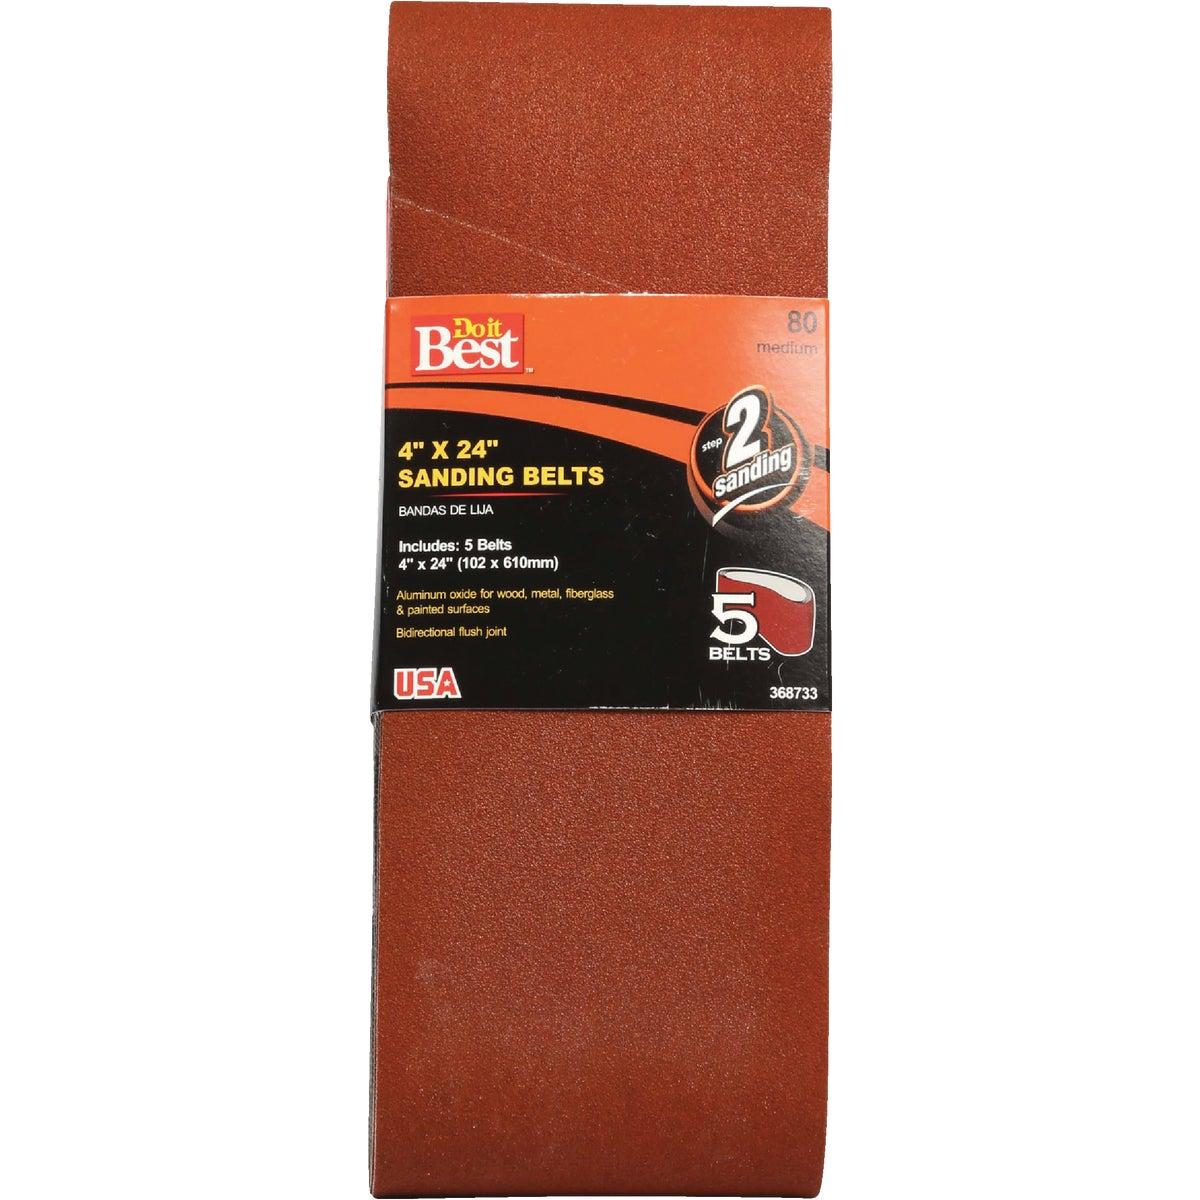 4X24 80X GRIT SAND BELT - 368733 by Ali Industries Inc